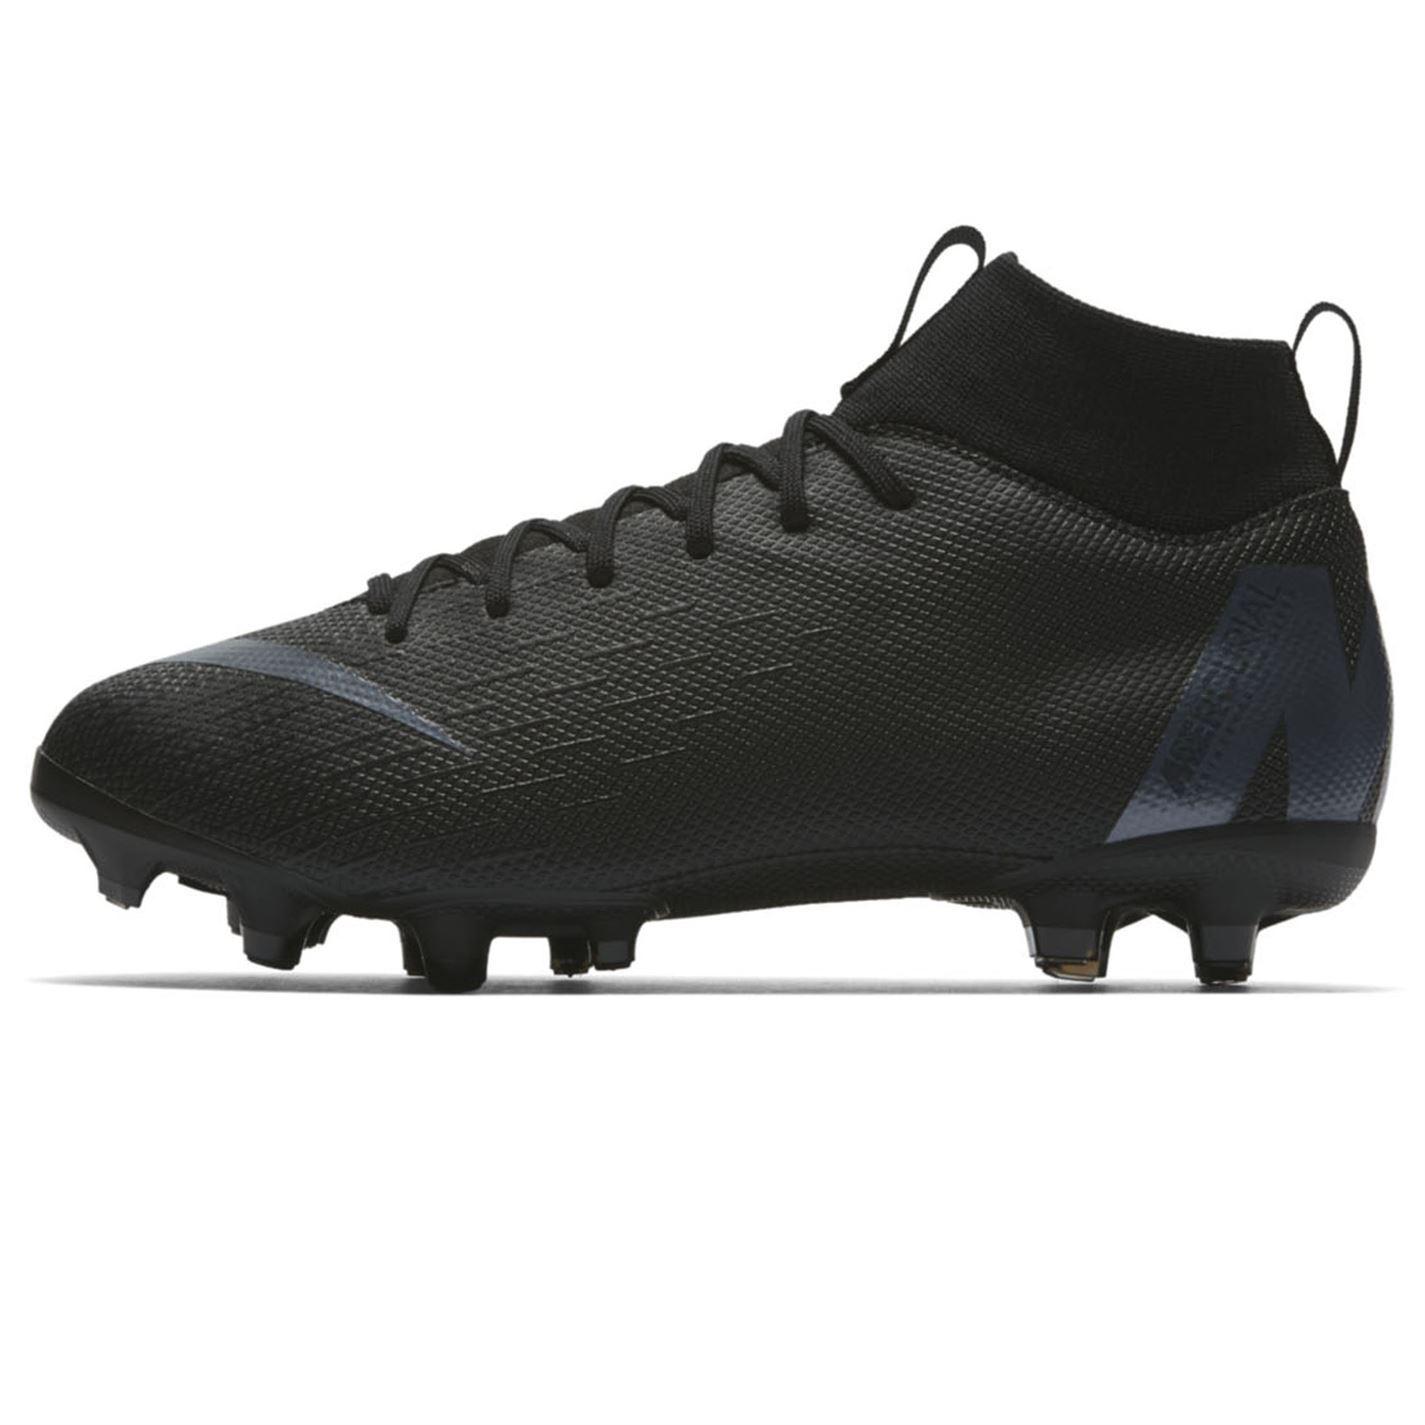 miniature 7 - Nike-Mercurial-Superfly-Academy-Terre-Ferme-Chaussures-De-Football-Juniors-Football-Crampons